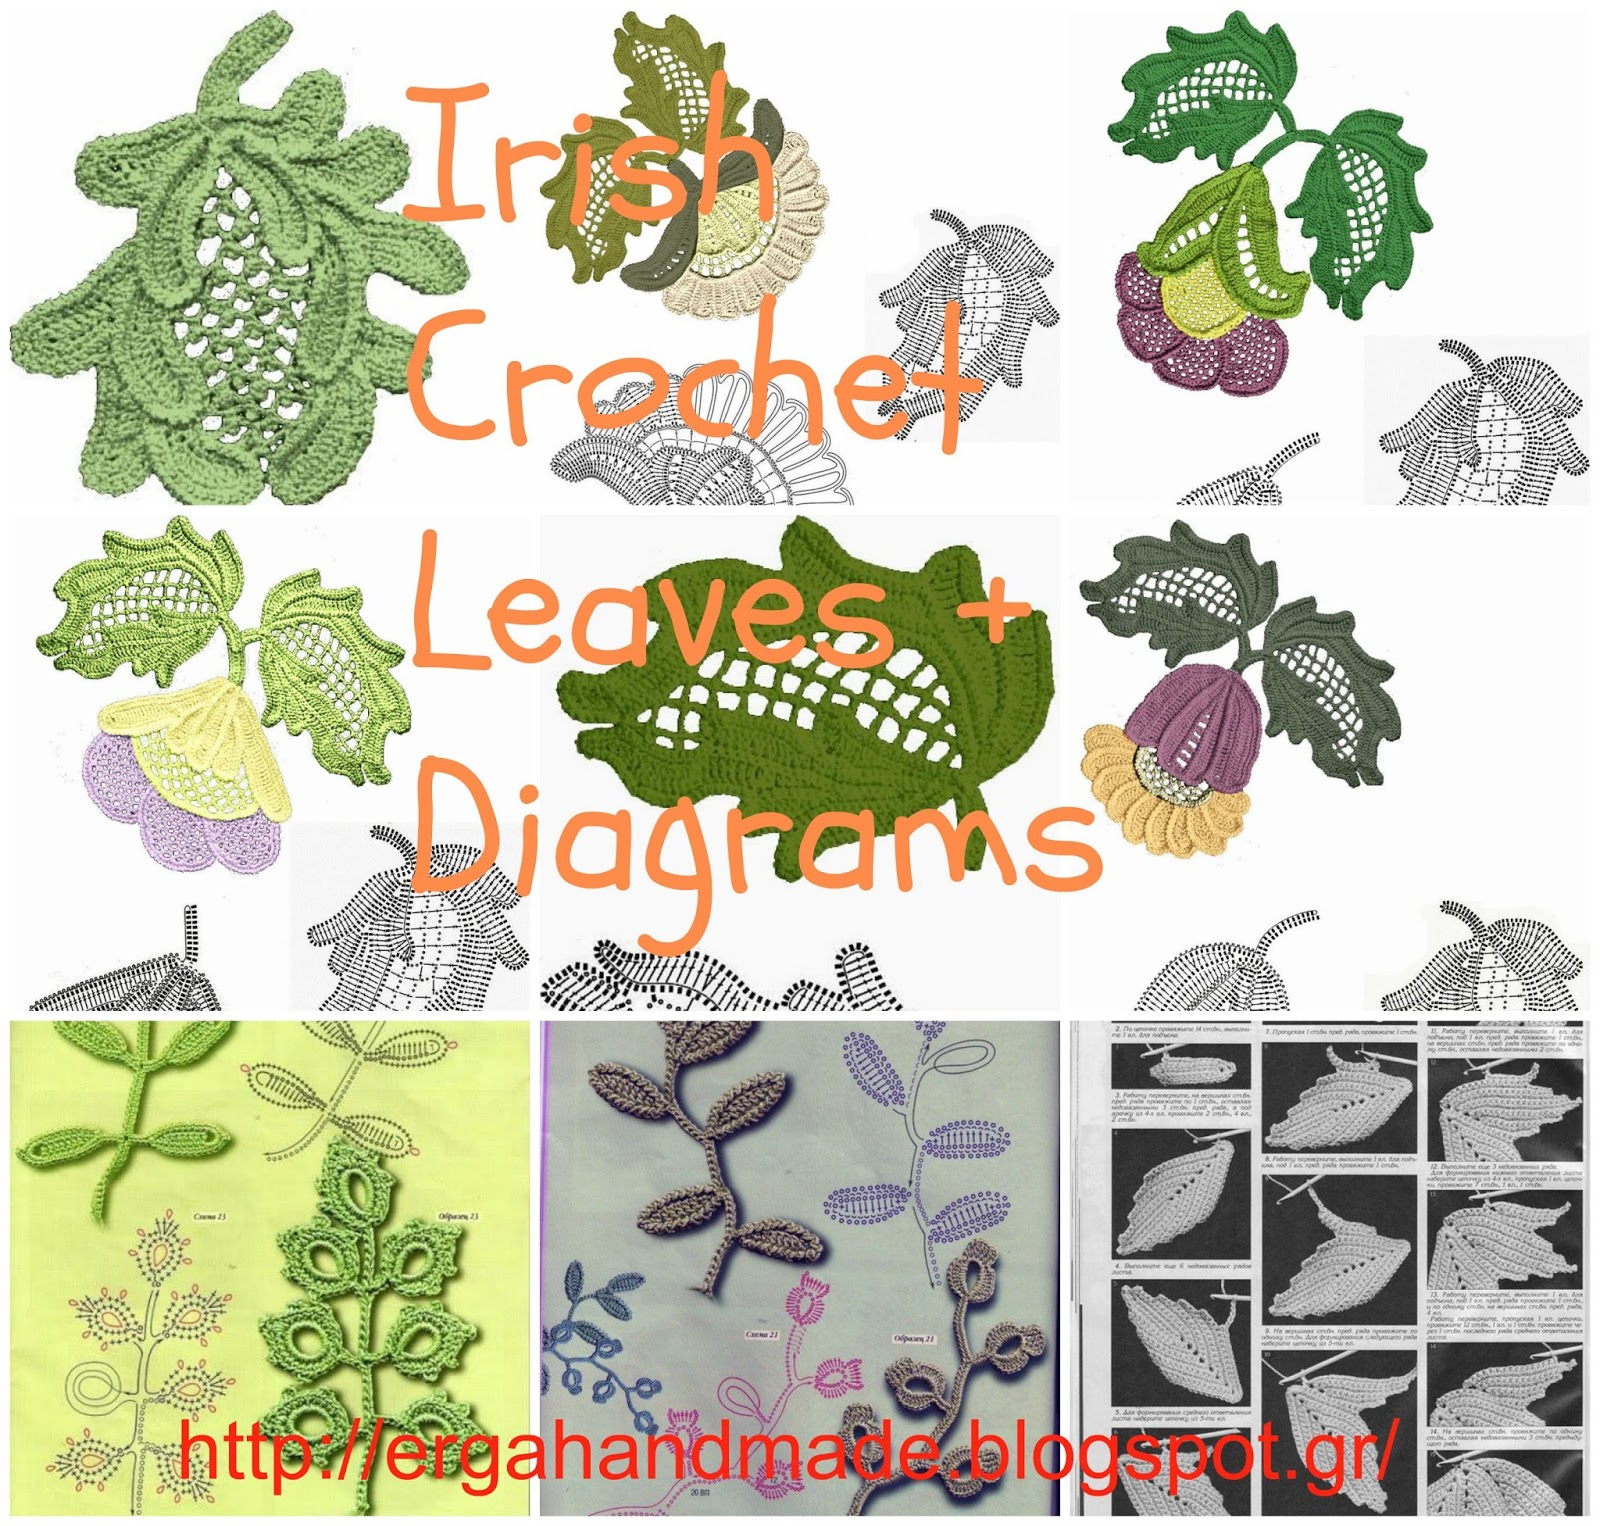 free leaf crochet pattern diagram 7 pin flat socket wiring ergahandmade irish leaves 43 diagrams